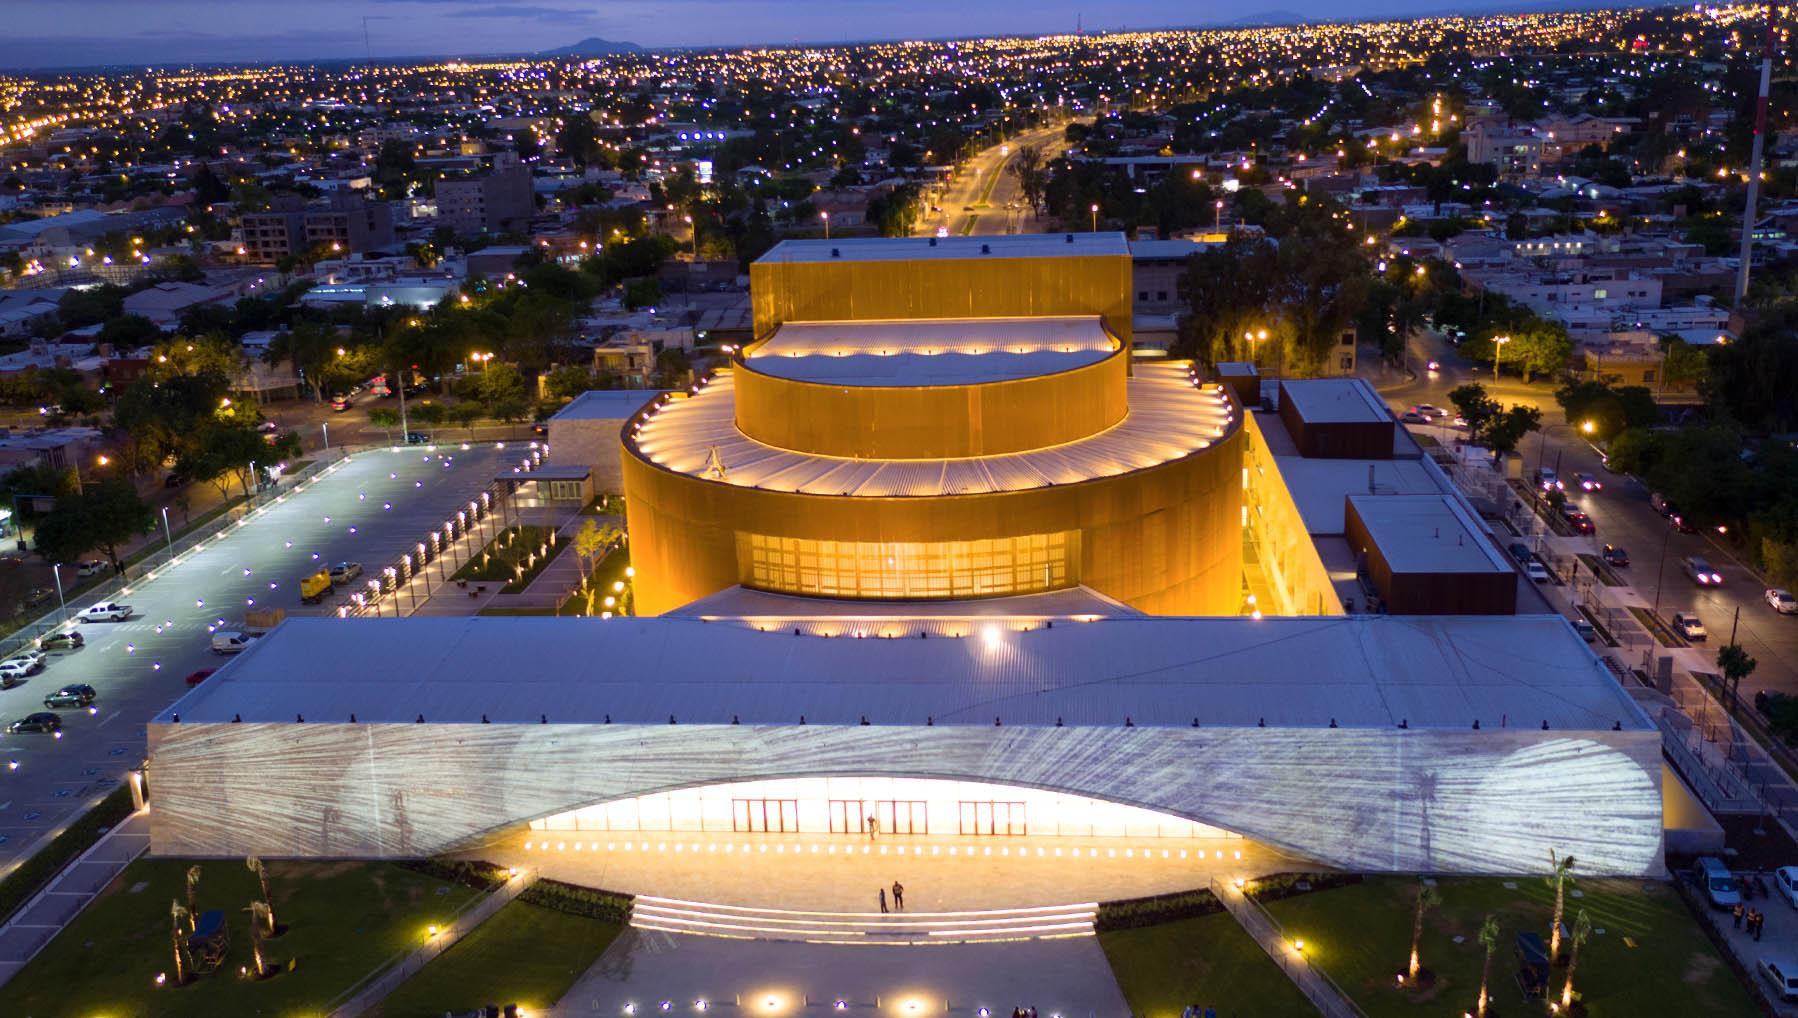 TeatrodelBicentenarioSanJuanPANEDILE